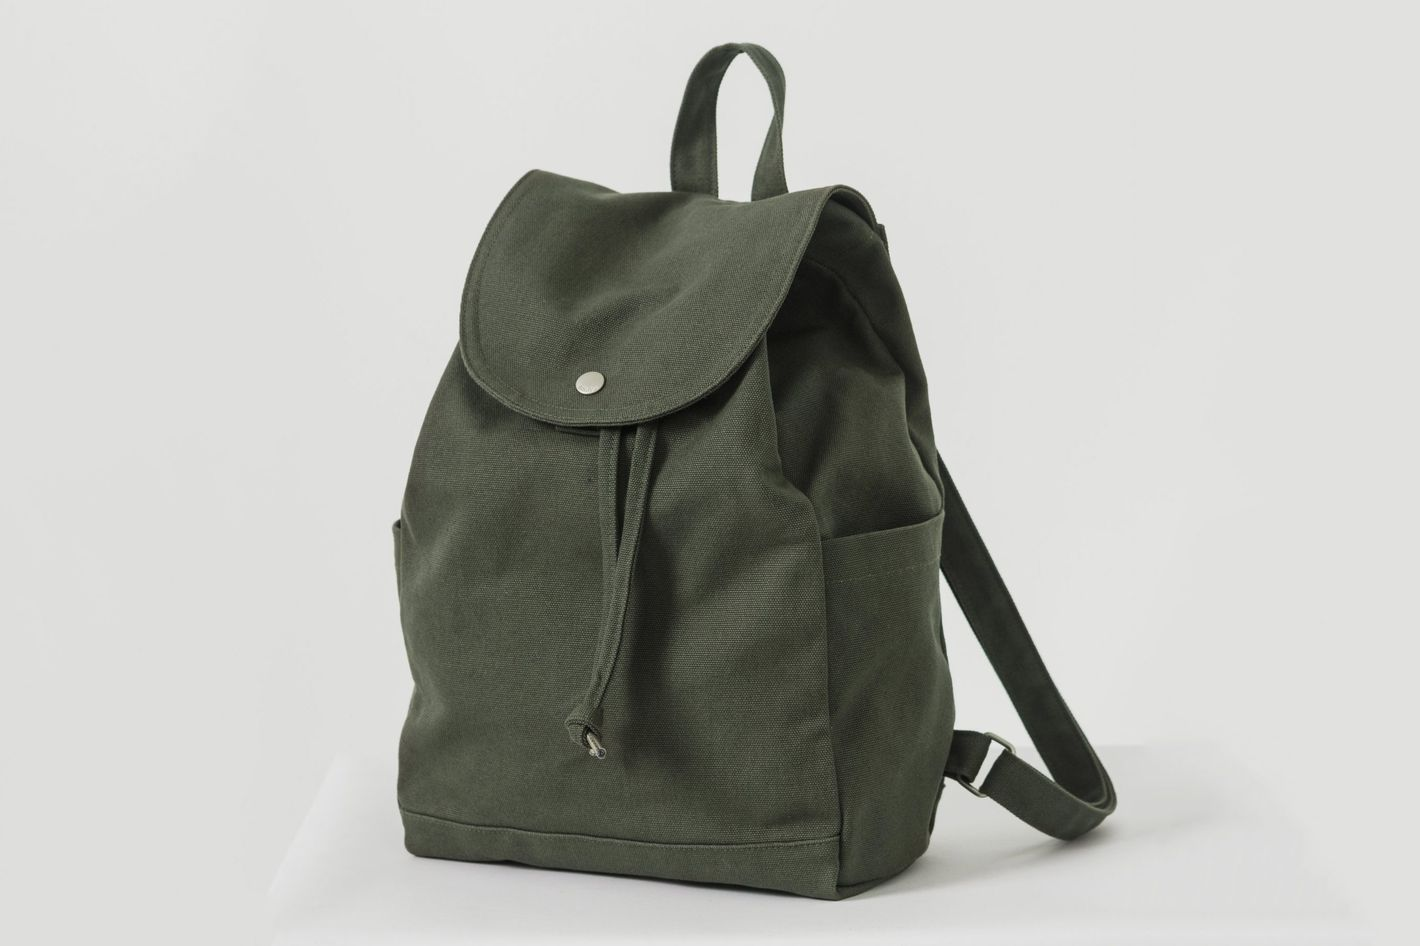 Baggu Drawstring Backpack, Dark Olive